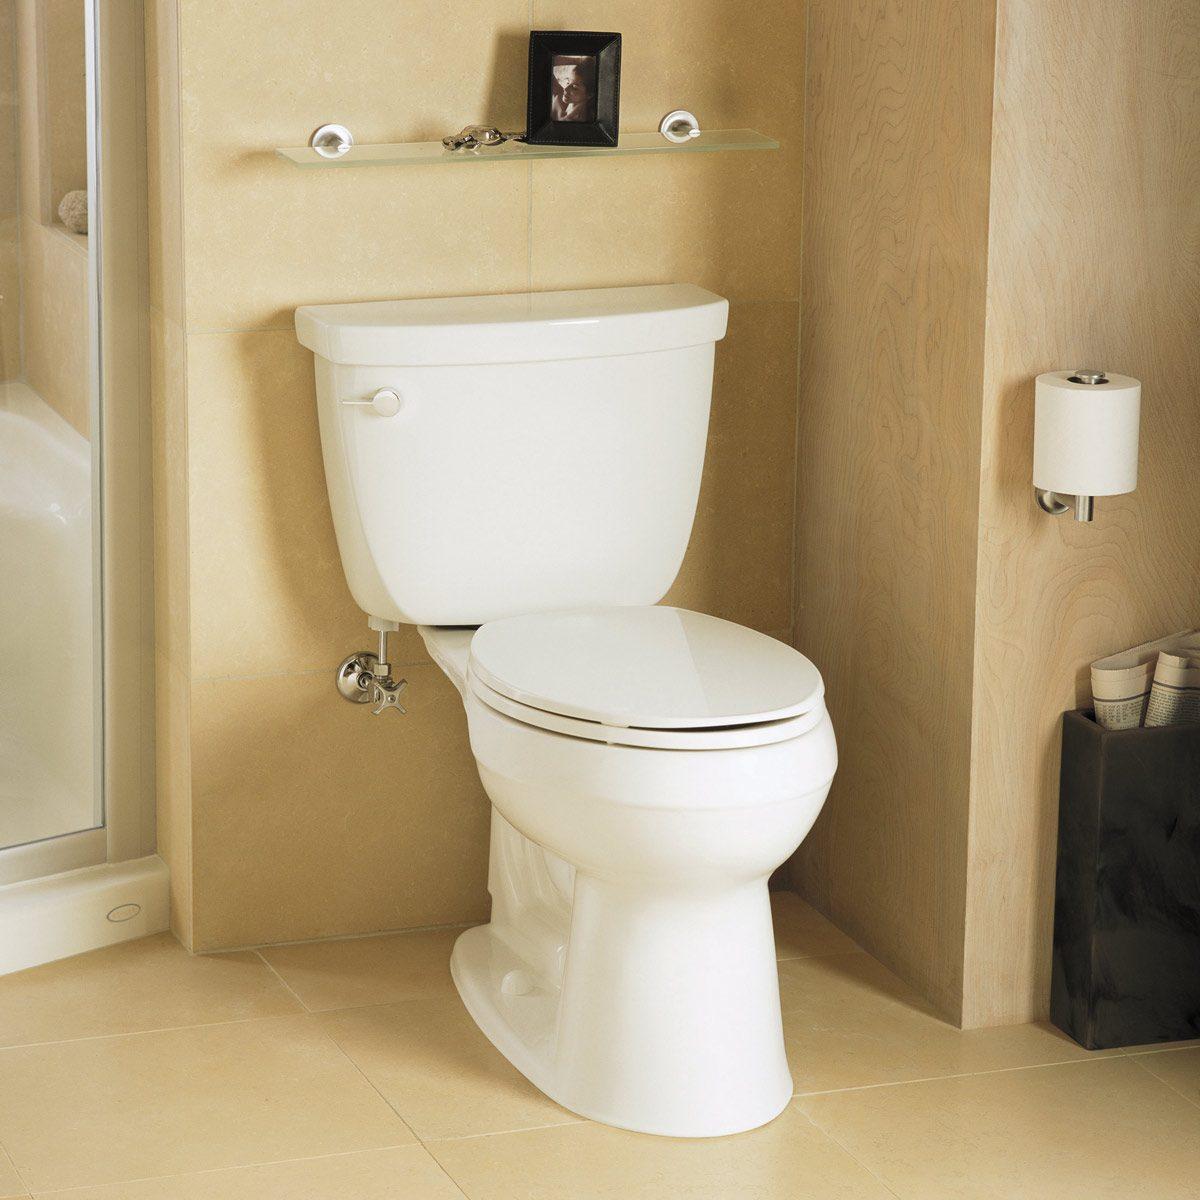 toilet shopping tips family handyman. Black Bedroom Furniture Sets. Home Design Ideas